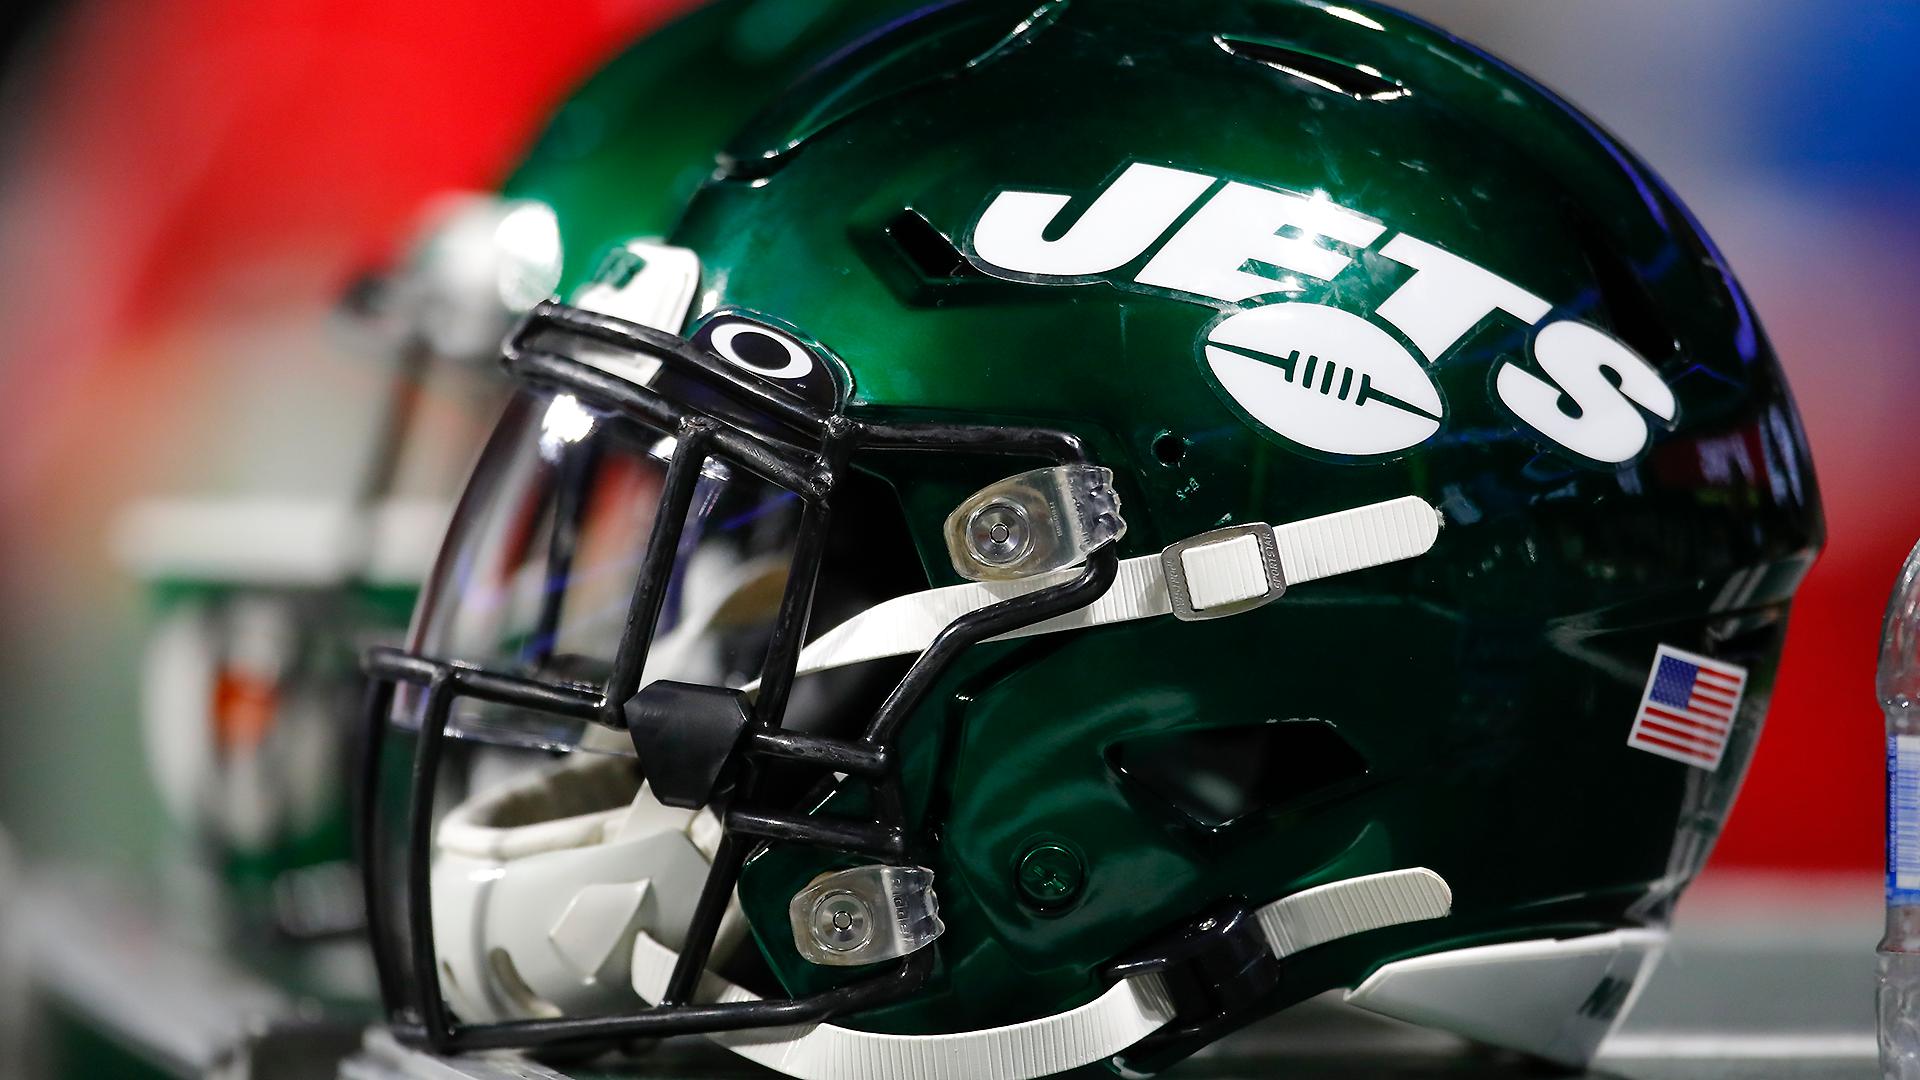 Jets players concerned about hidden locker room cameras: 'I'm pissed'